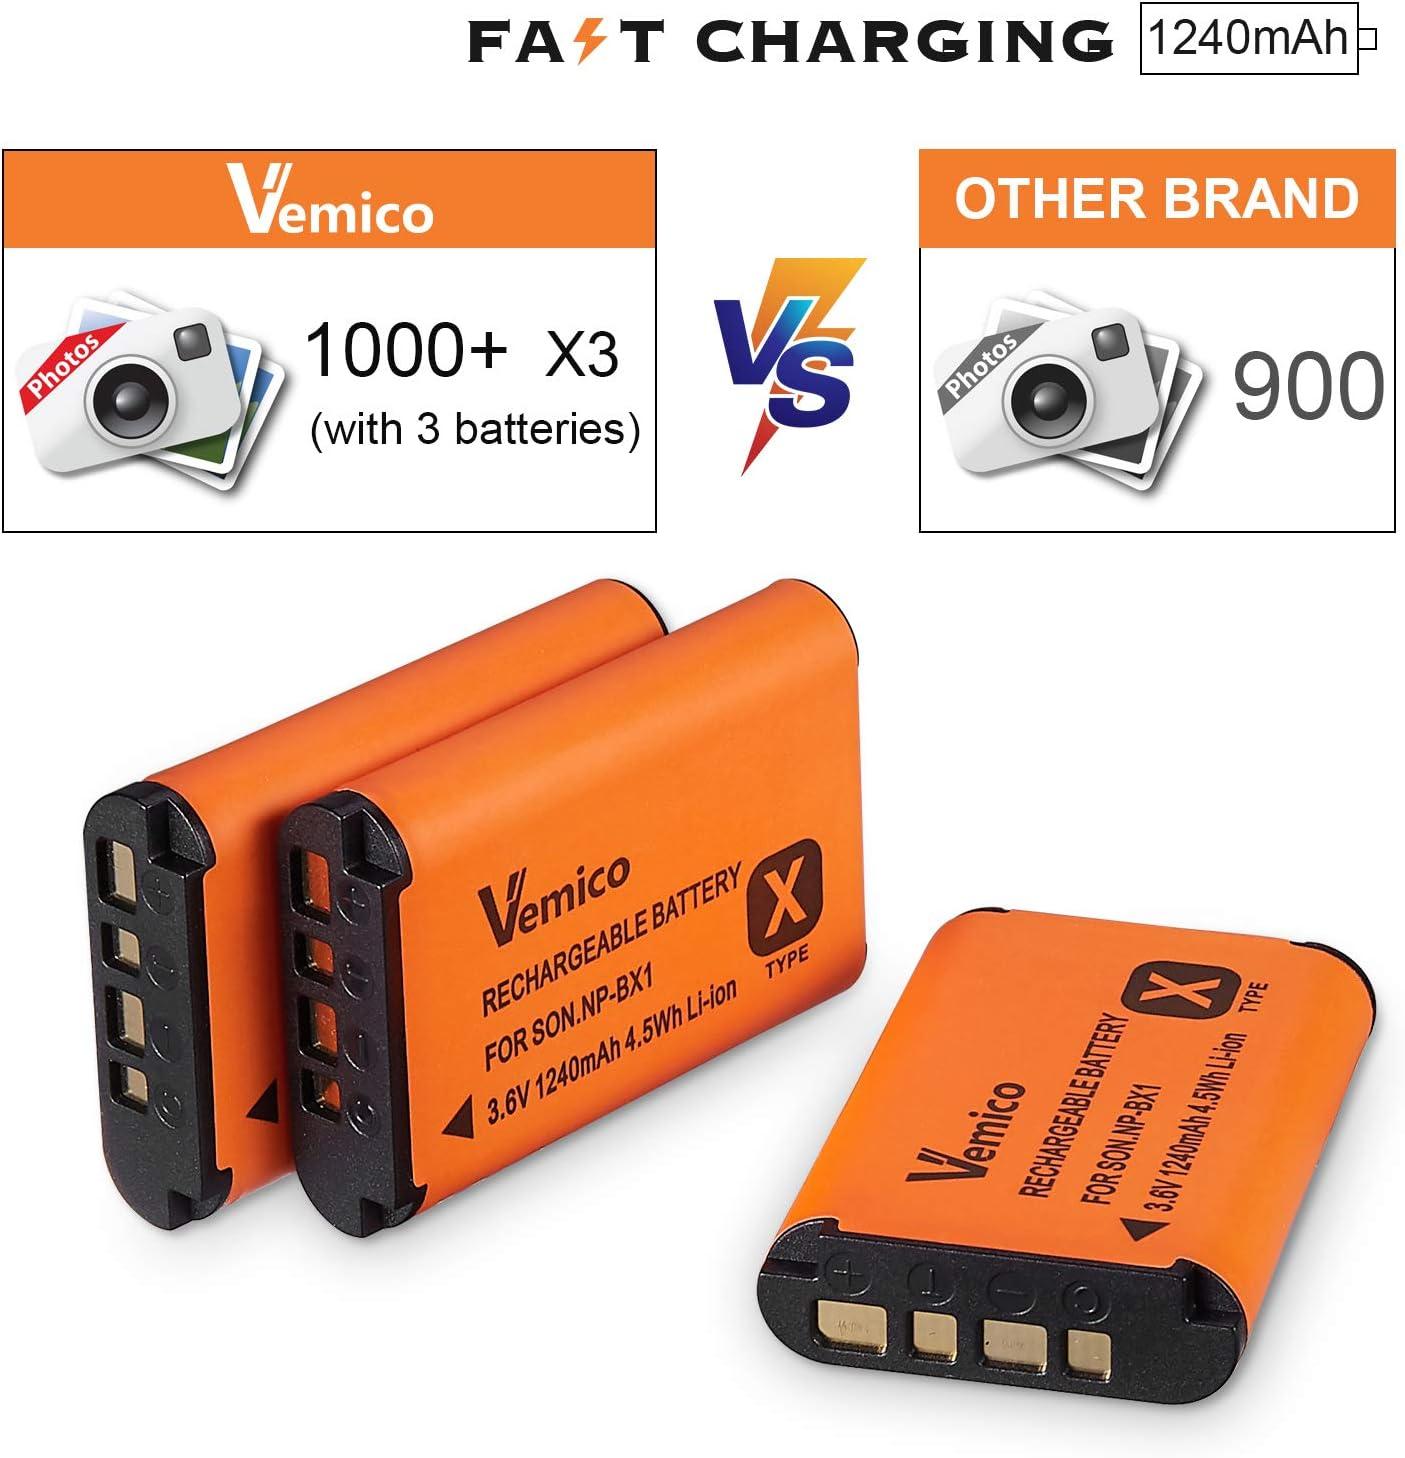 Vemico NP-BX1 Akku Ladeger/ät Satz 3 x 1240mAh Ersatzbatterien LCD Ladeger/ät mit Typ-C-USB f/ür Sony NP-BX1//M8//Cyber-Shot//RX100//RX100 II//RX100M II//RX100 III//RX100 IV//RX100 V//RX100 VII